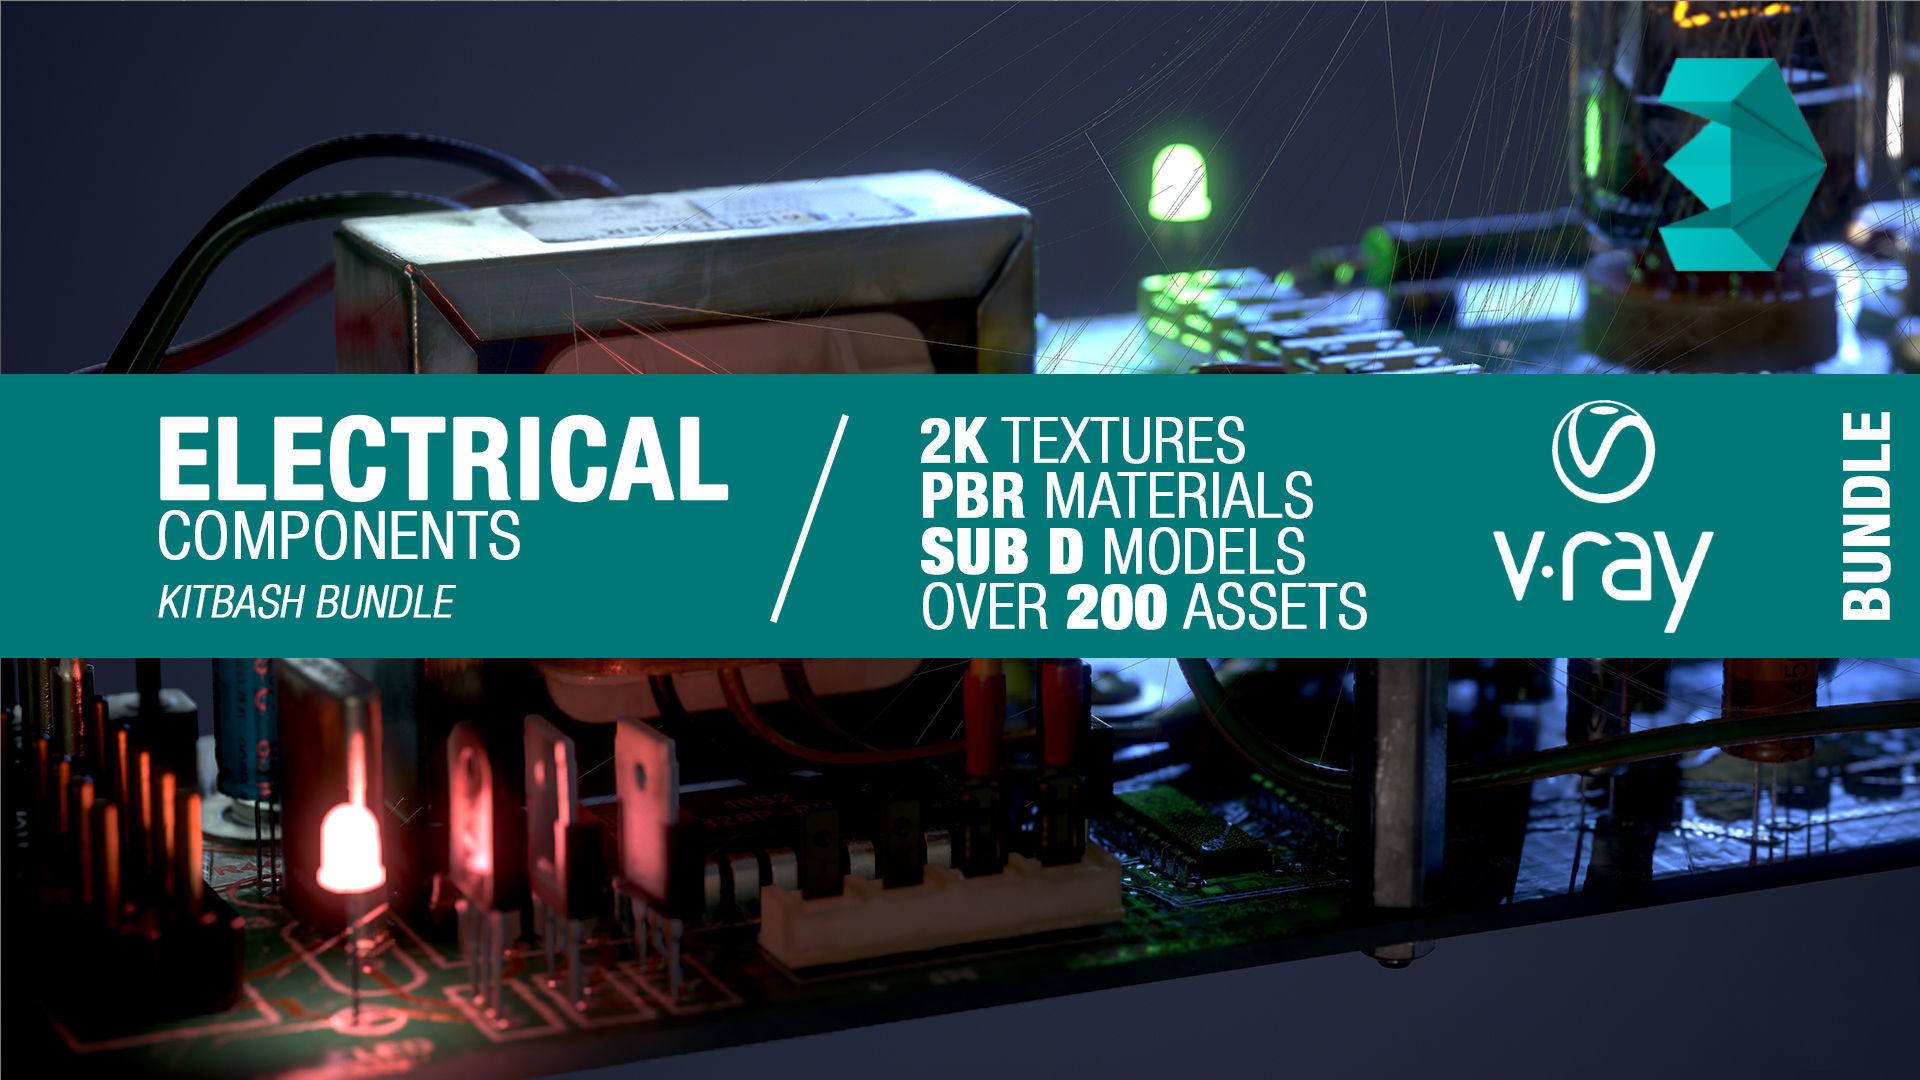 Electrical components bundle